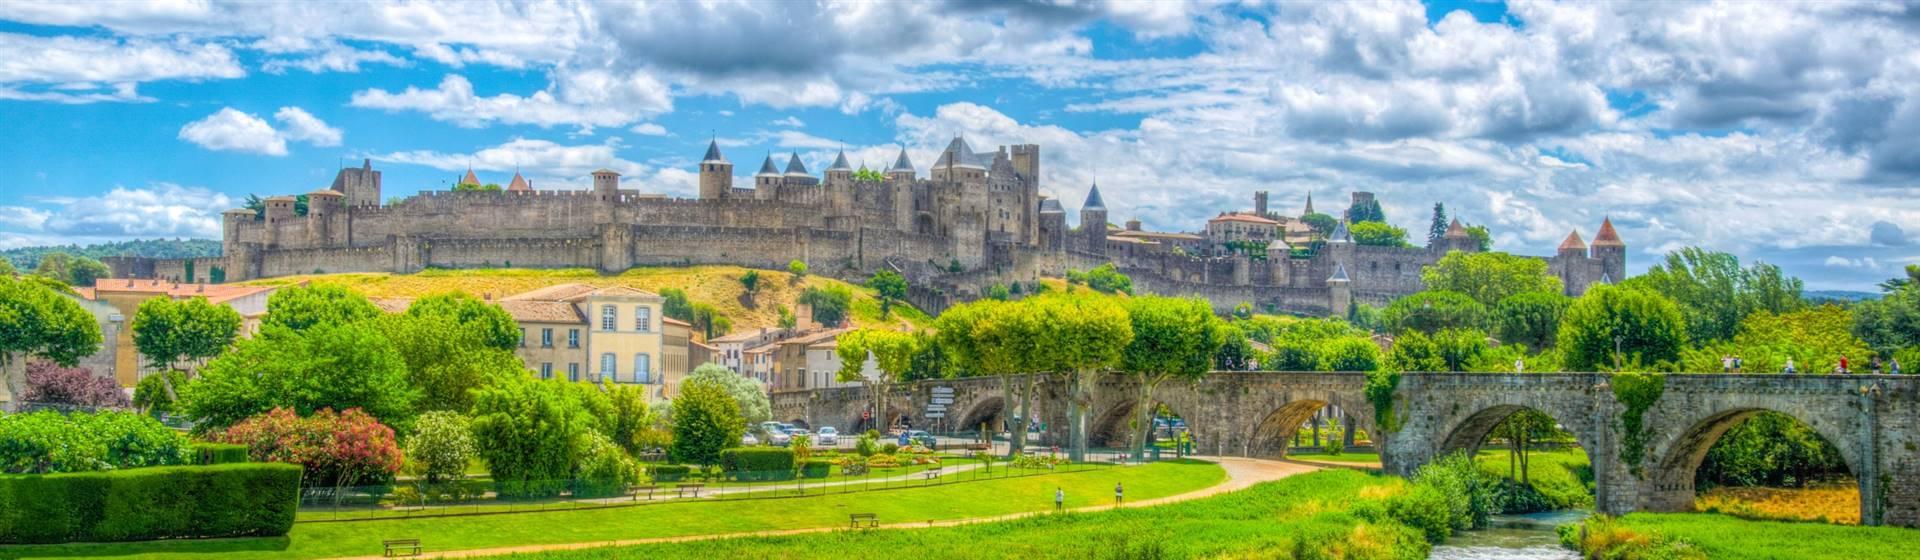 "<img src=""carcassonnecastlefrance2shutterstock_1221540049.jpeg"" alt=""Carcassonne Castle""/>"